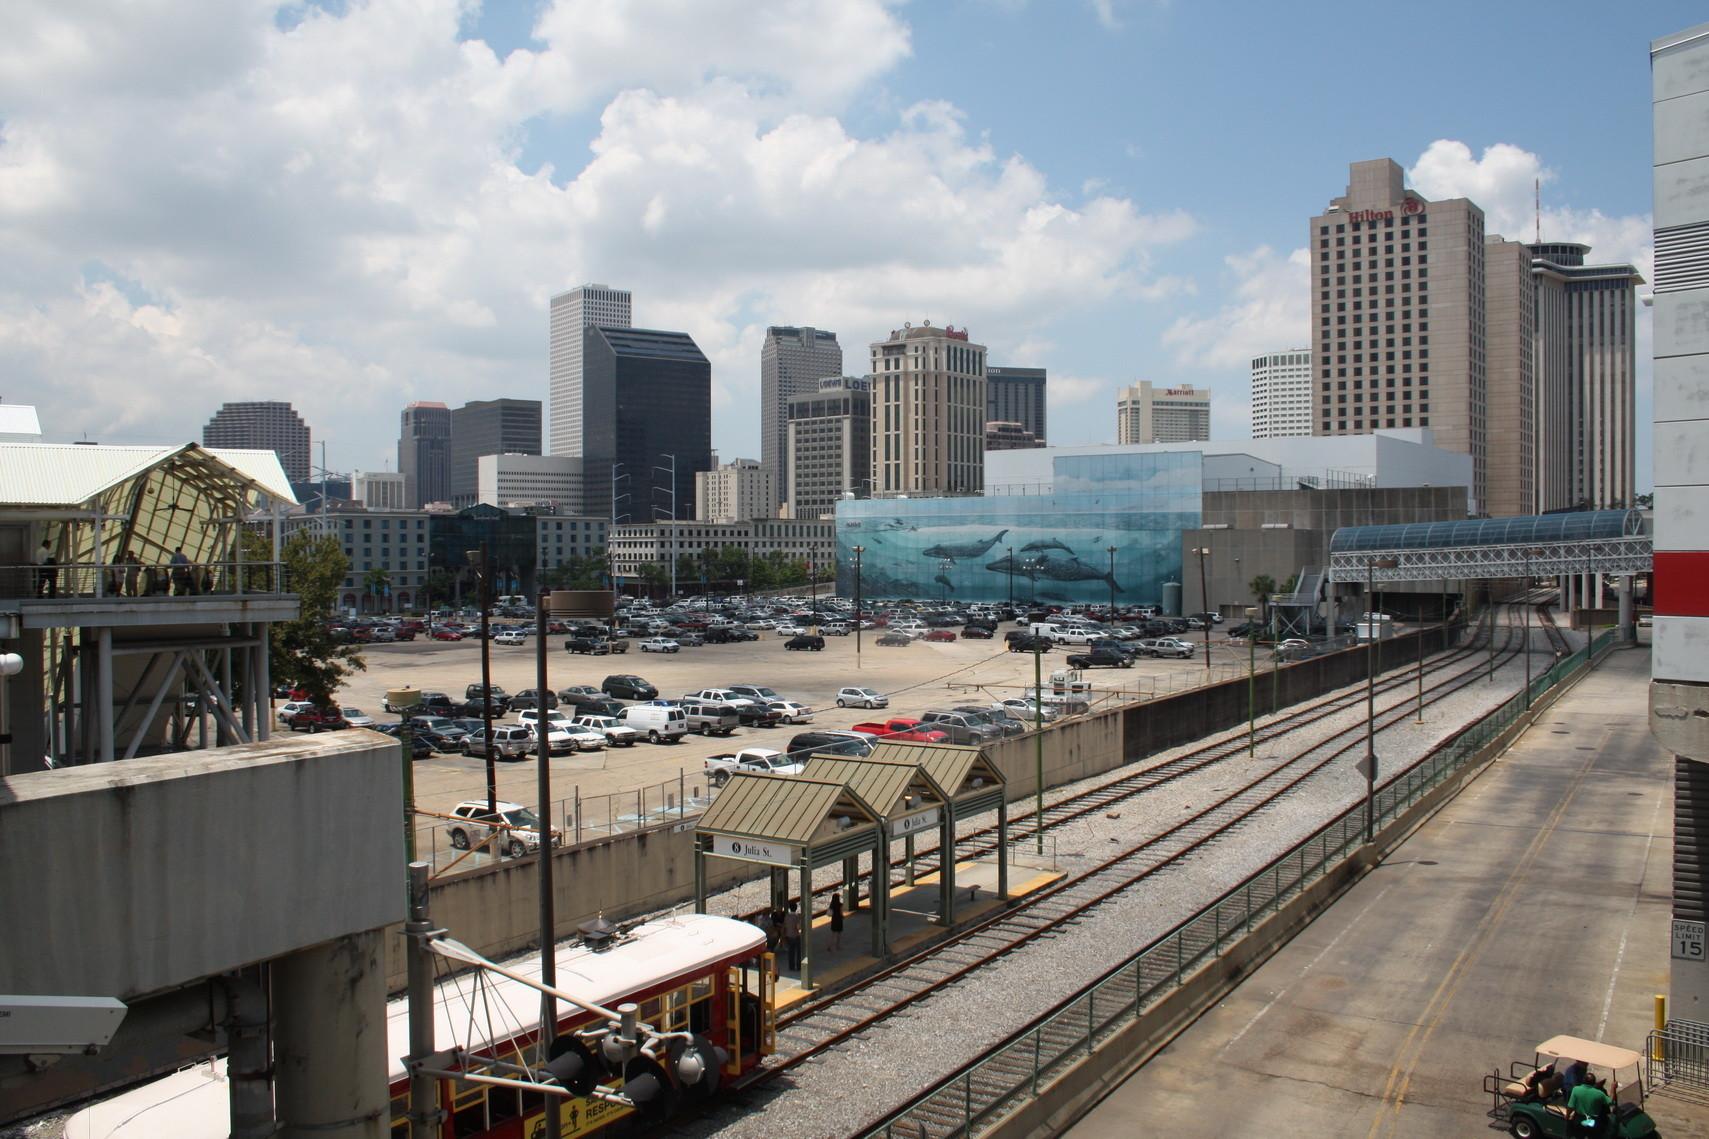 New Orleans VI